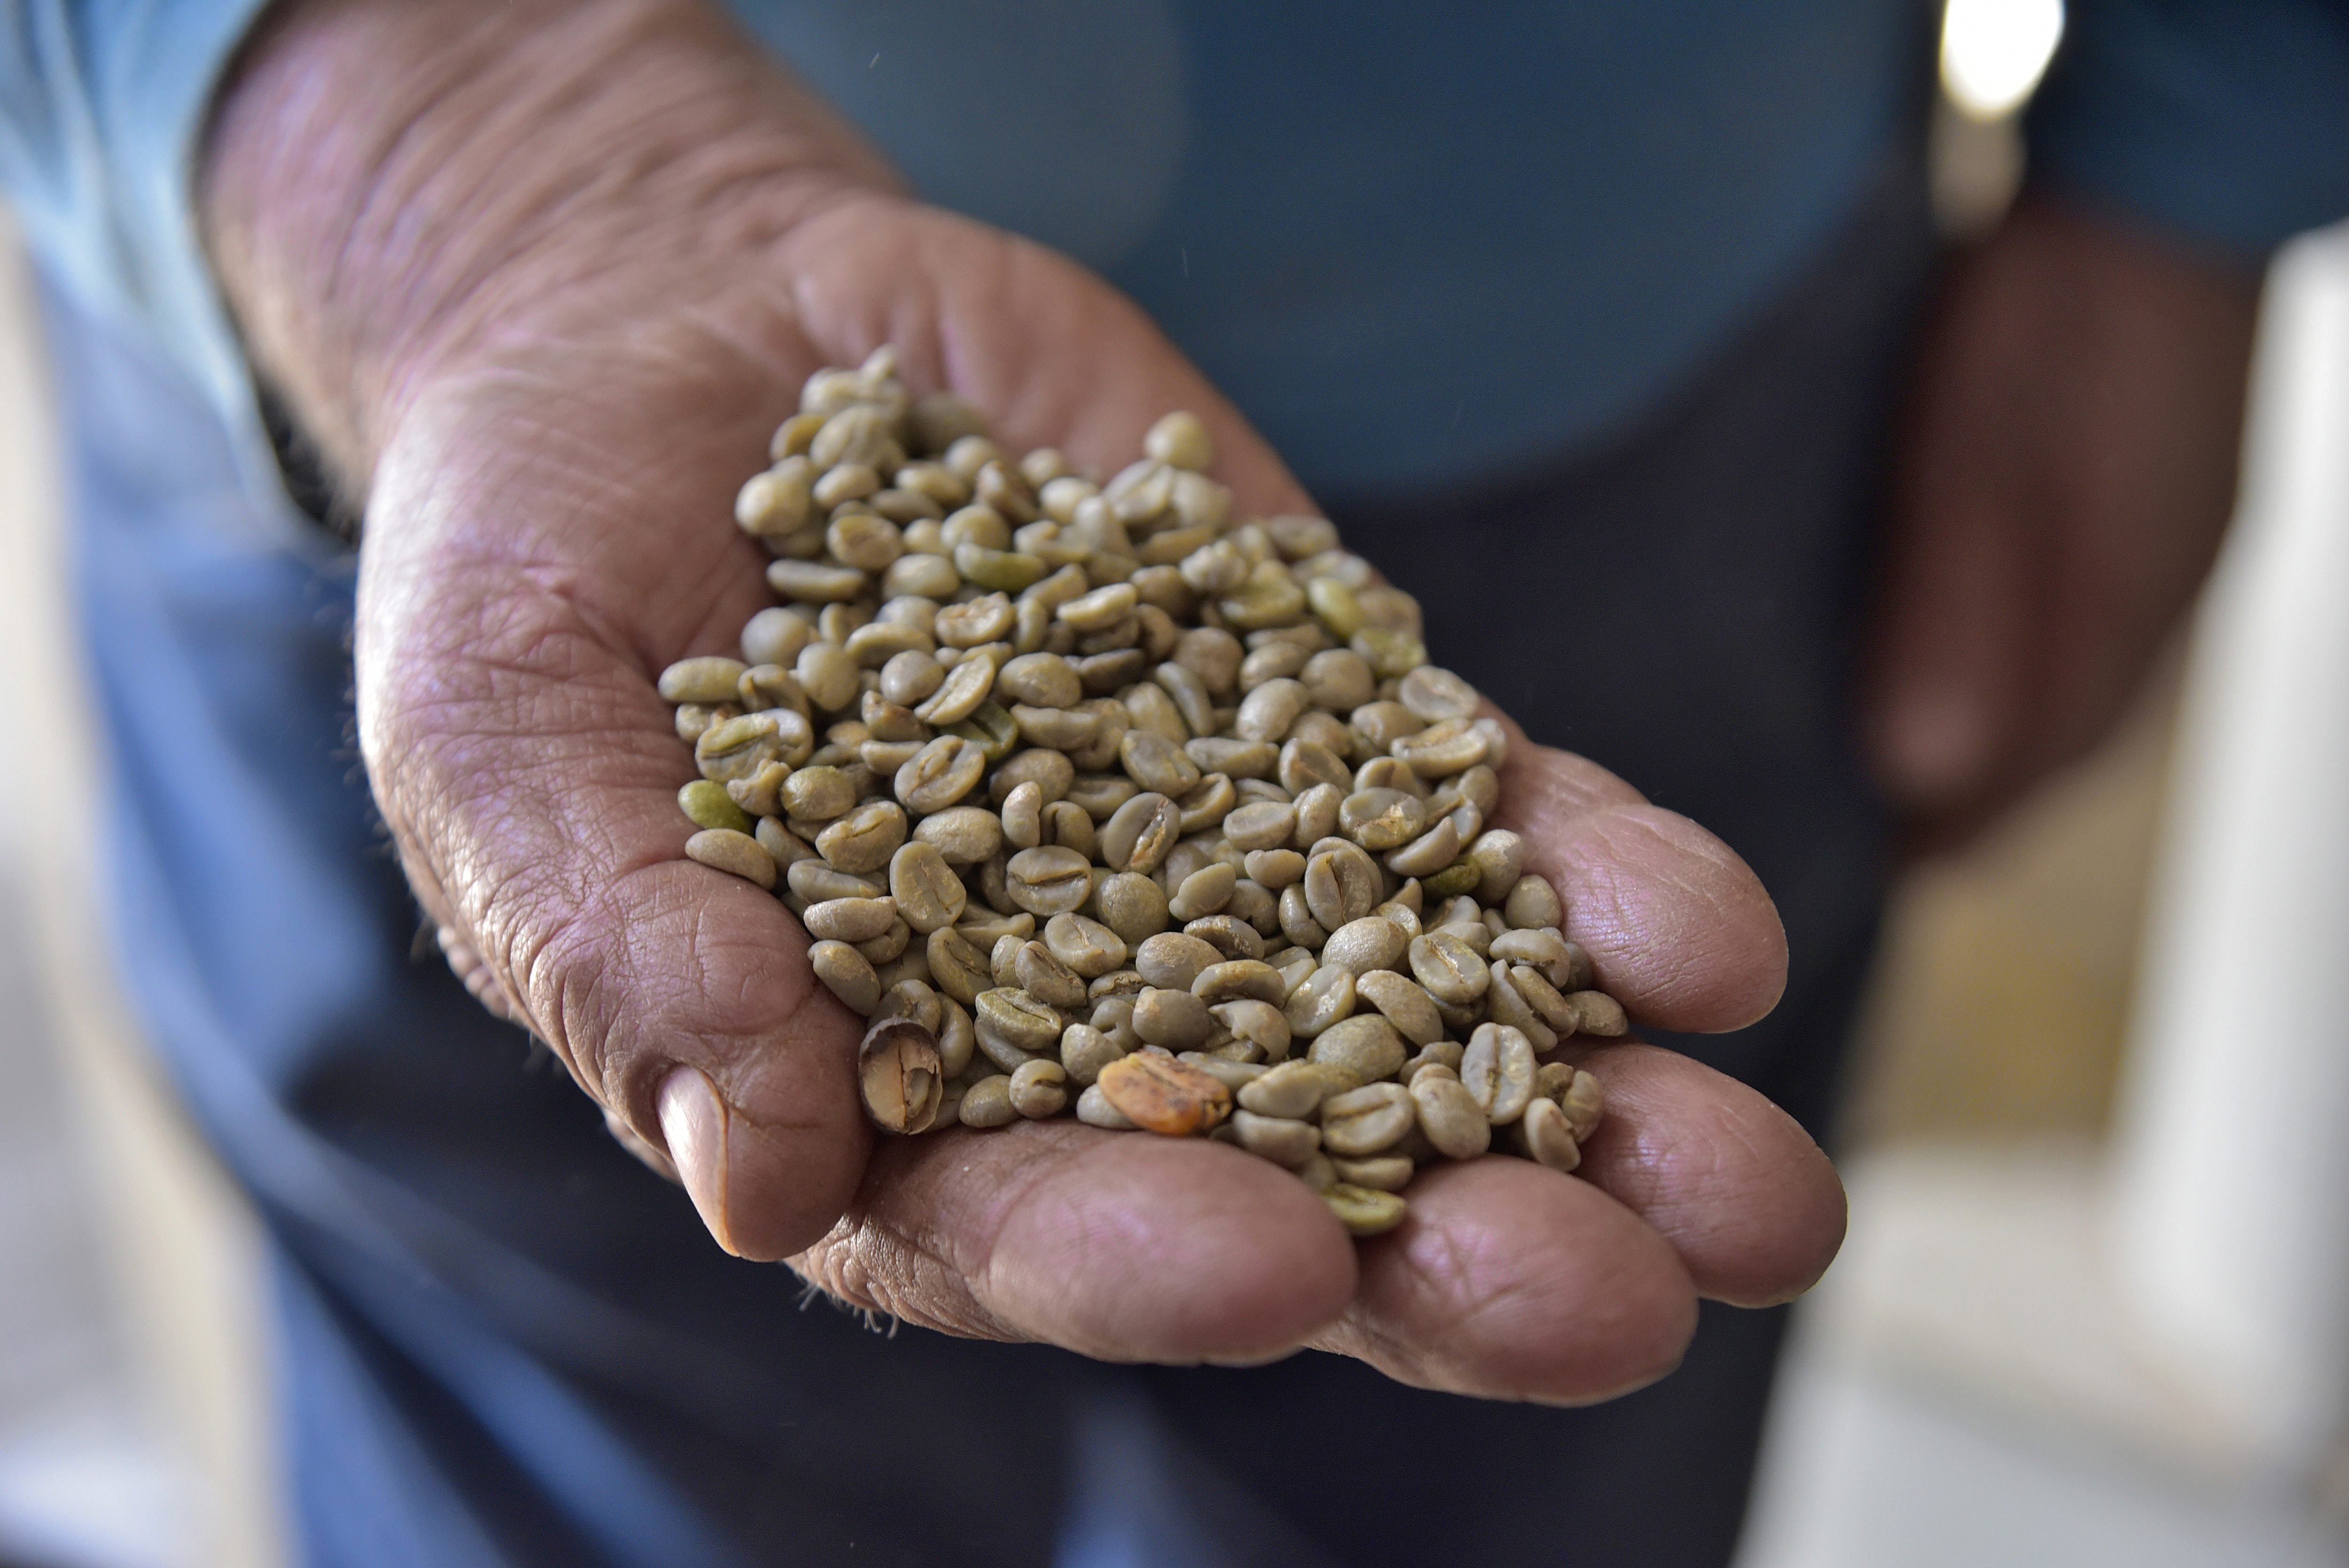 conheca antonio terceira geracao familia vive cafe mg vida